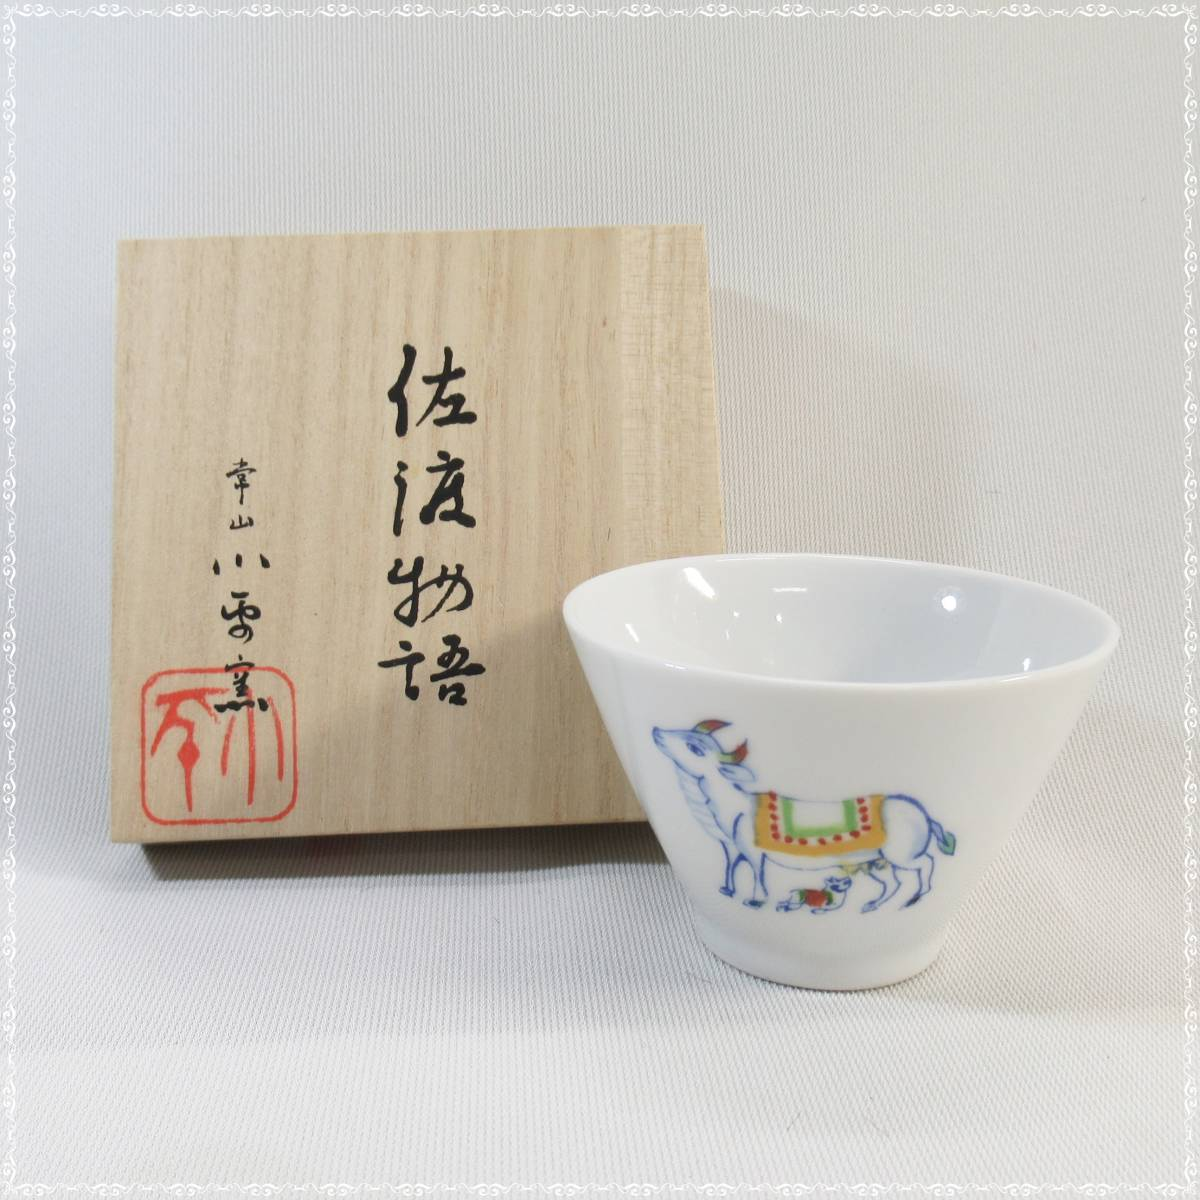 三浦小平二 常山 小平窯 「佐渡物語」 ぐい呑 共箱